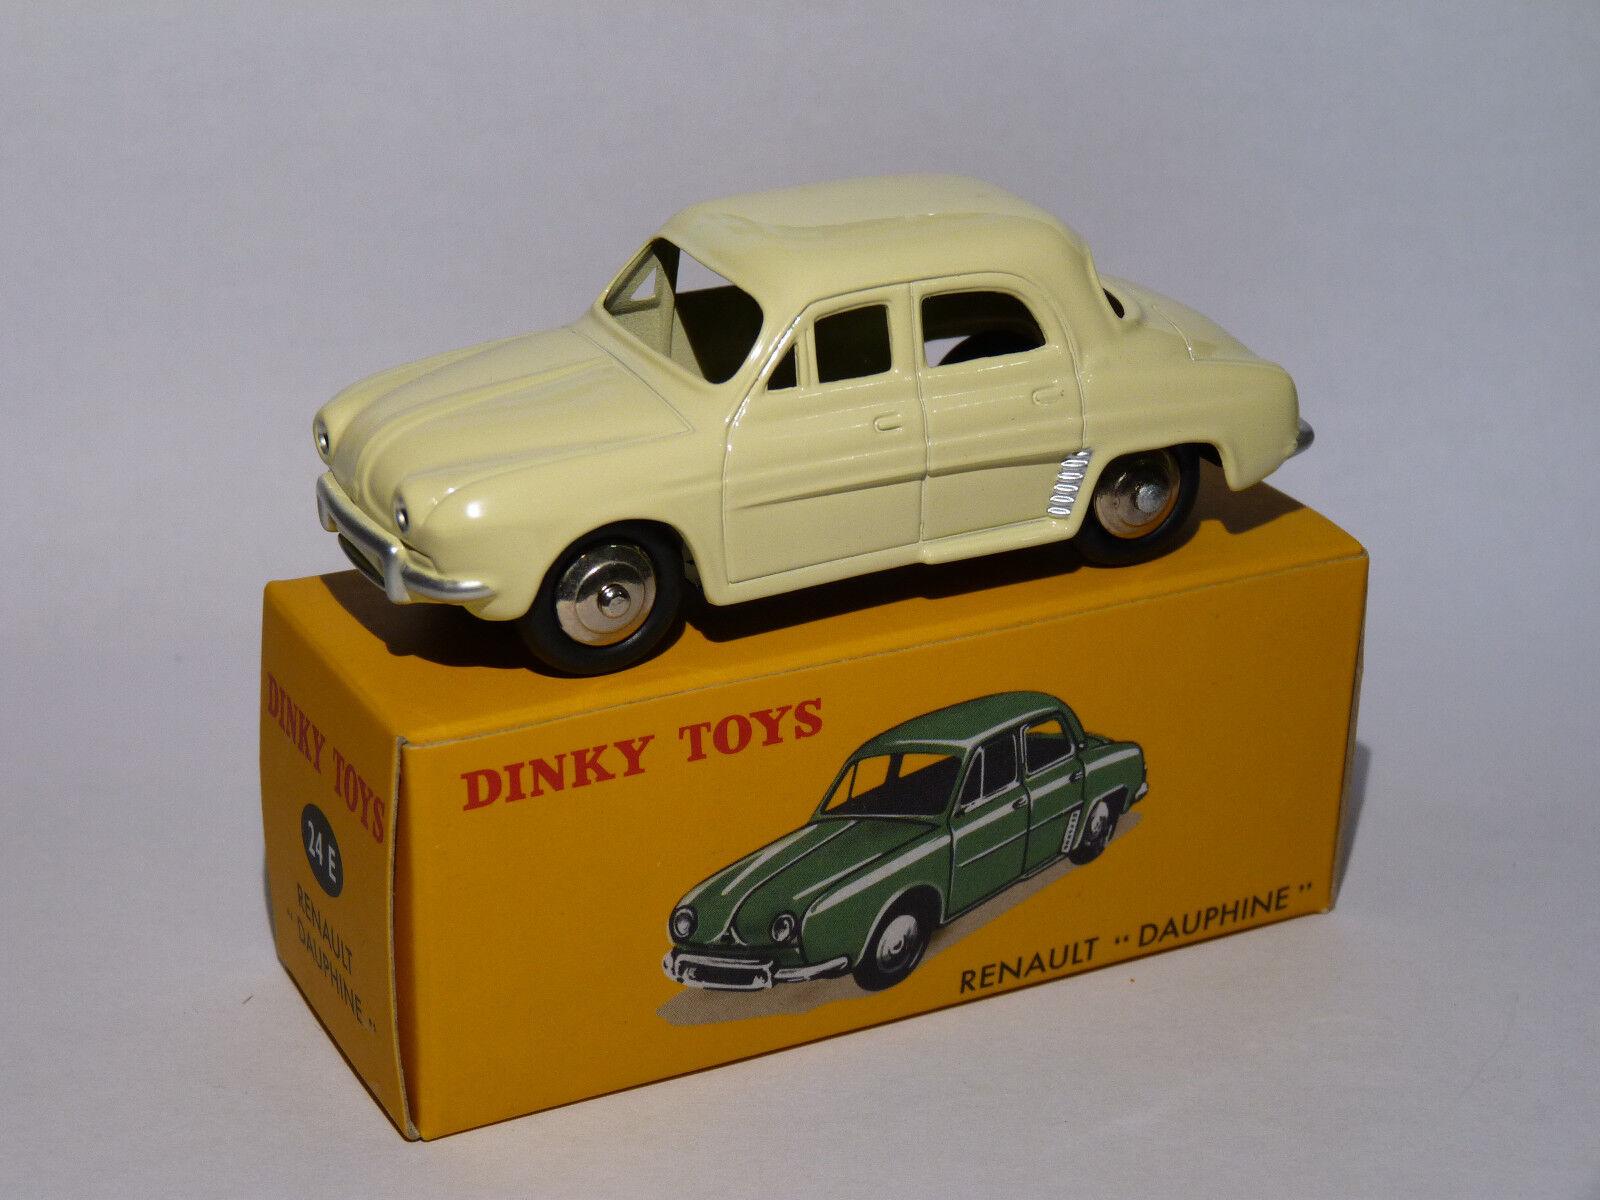 Renault DAUPHINE - ref 24E   24 E to the 1 43 dinky toys atlas